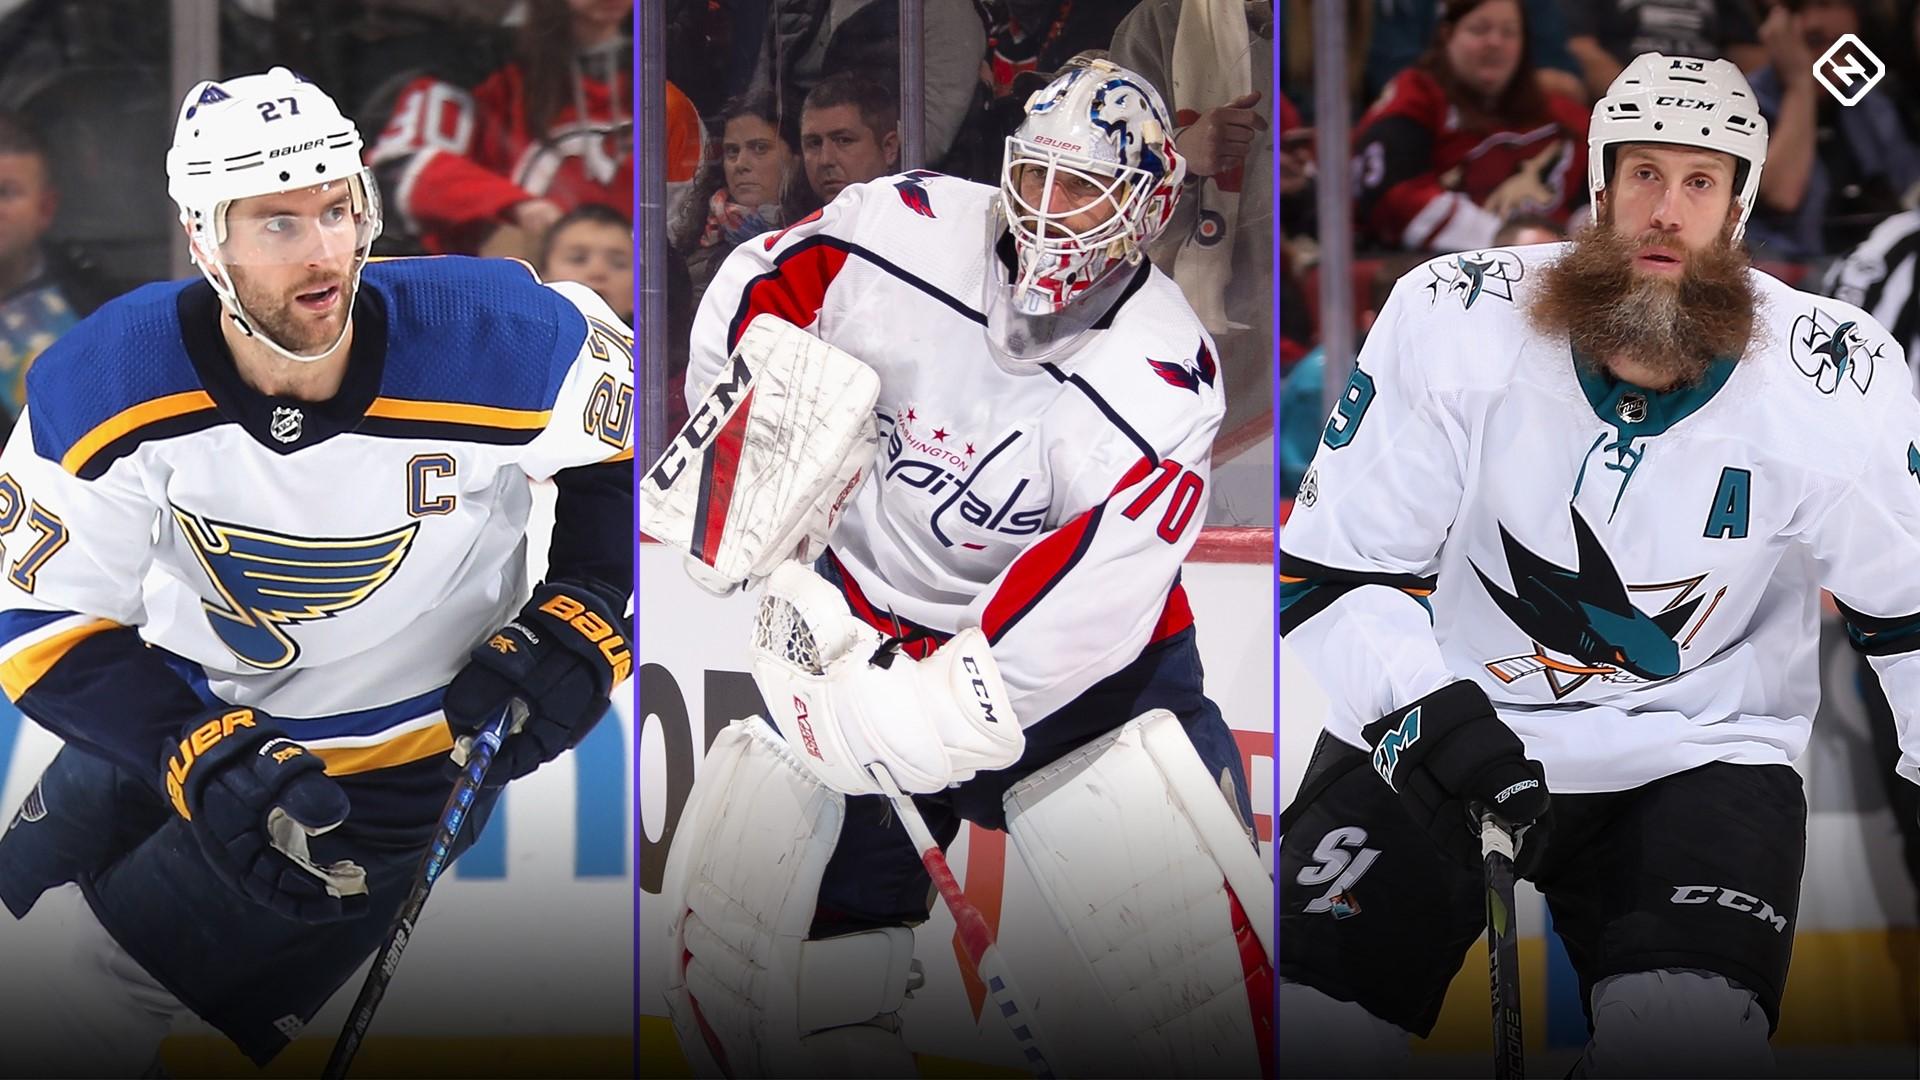 NHL free agency 2020: Complete list of all 31 teams' UFA, RFA players